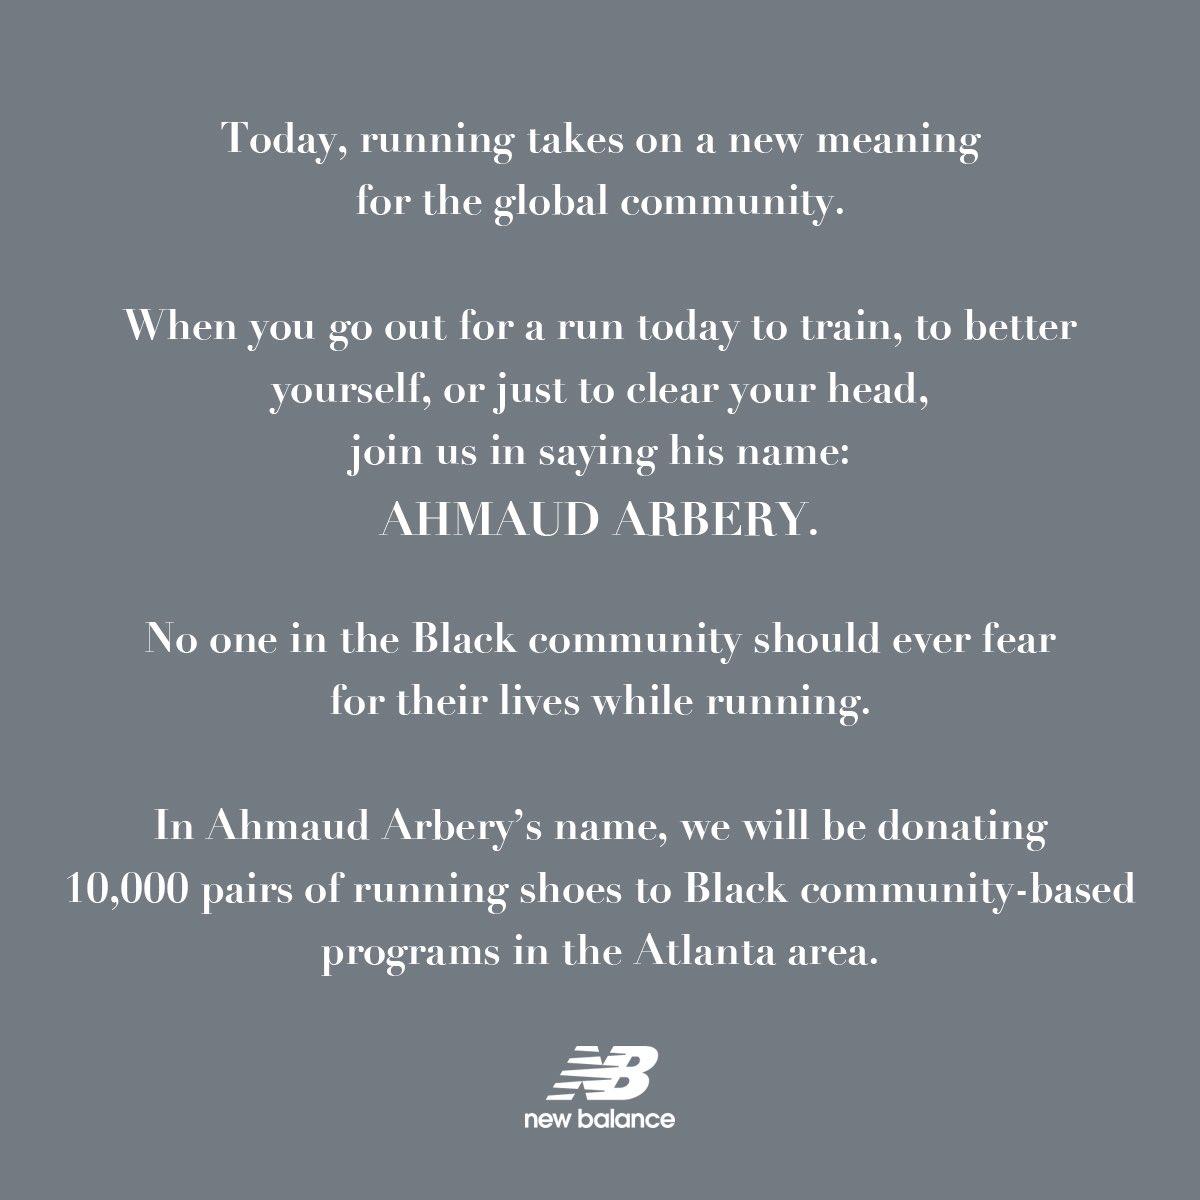 A first step.  #GlobalRunningDay #AhmaudArbery #BlackLivesMatter https://t.co/0Hi7oSg2gF